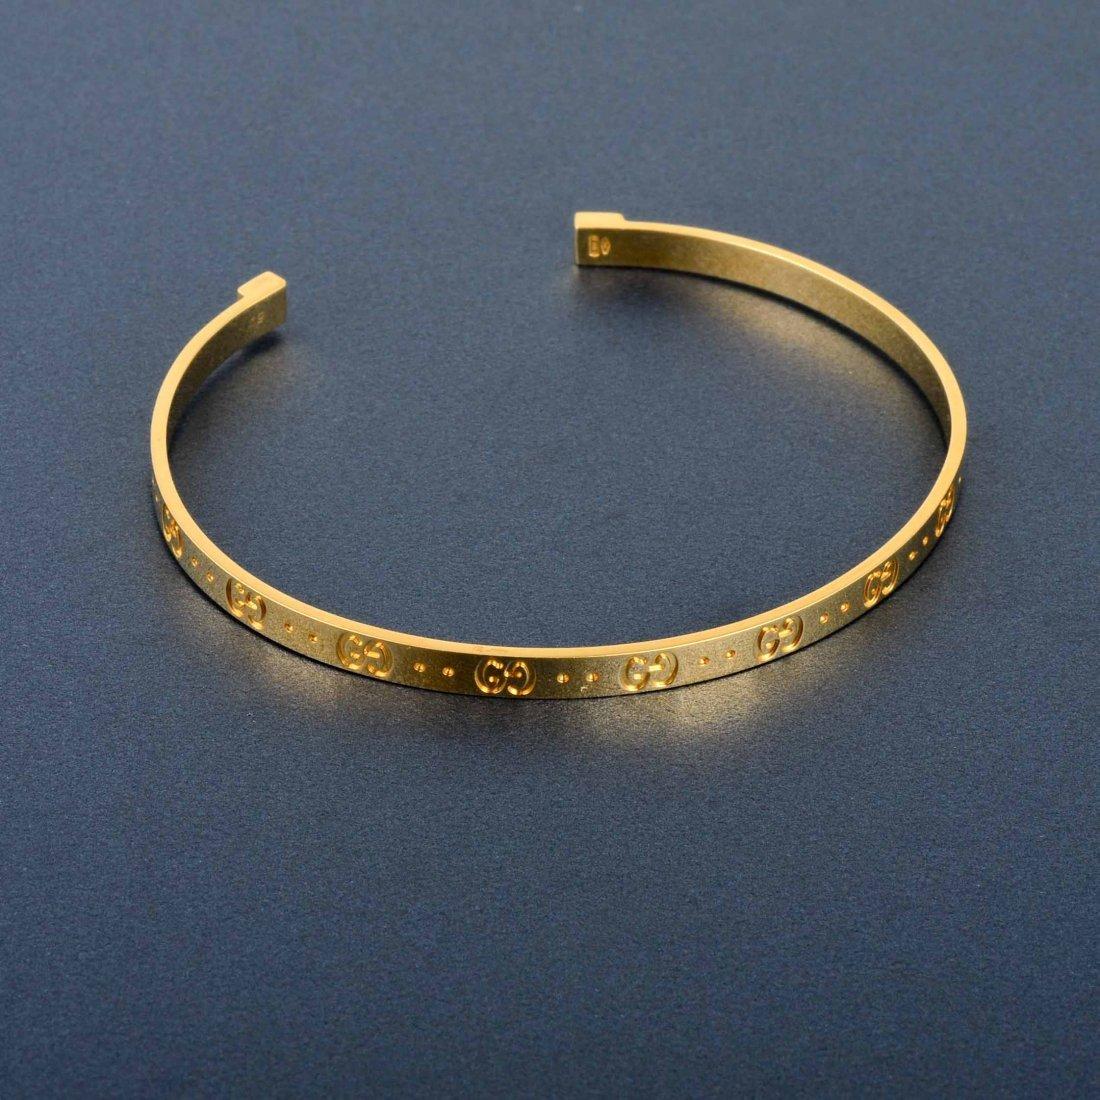 Bangle Bracelets Gold Gucci Gold Open Bangle